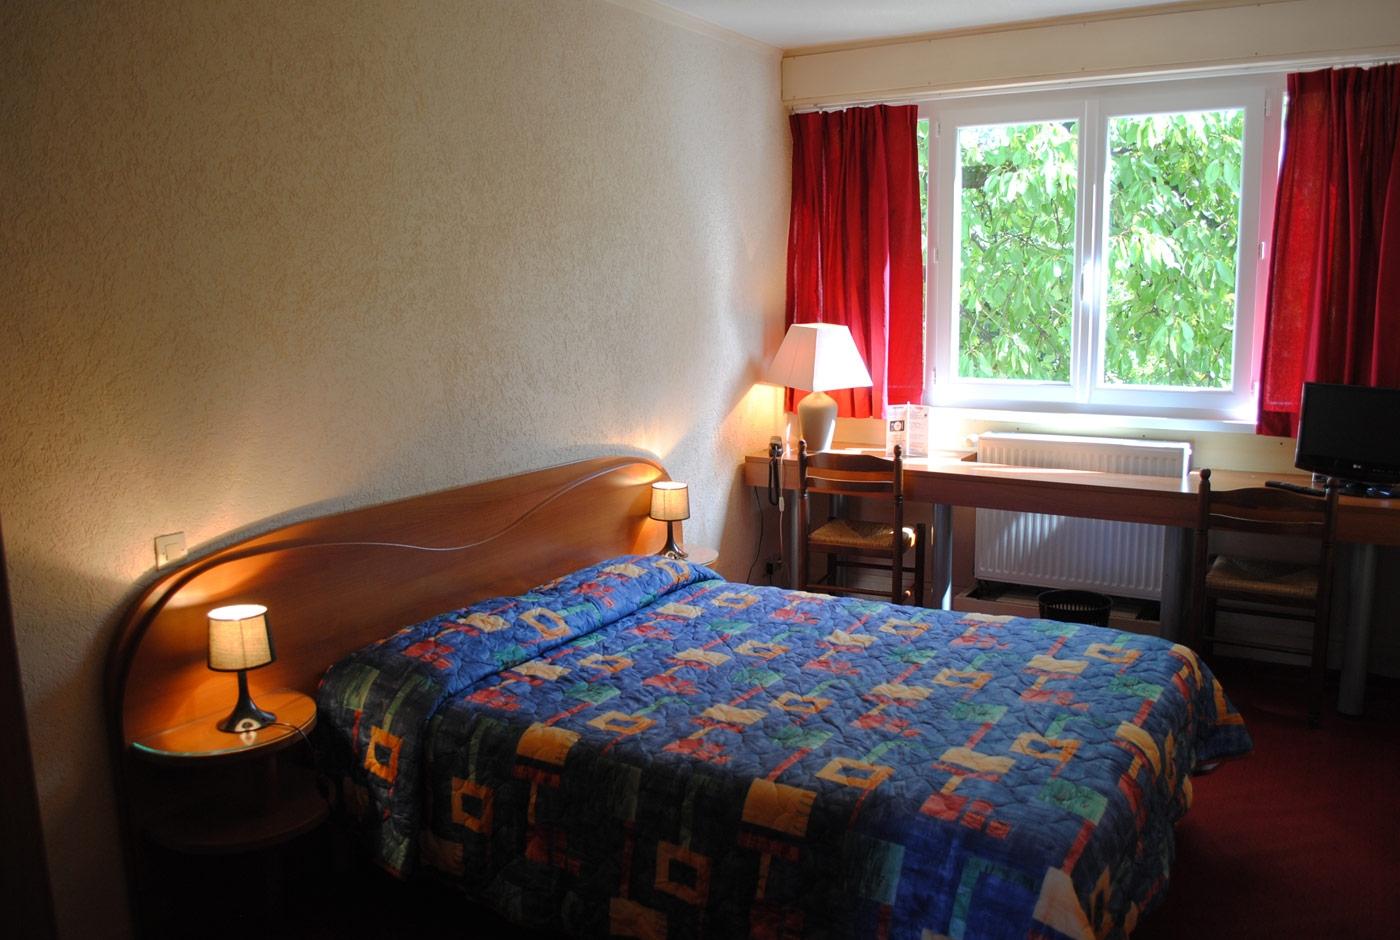 hotel-lacassagne-home-slide09